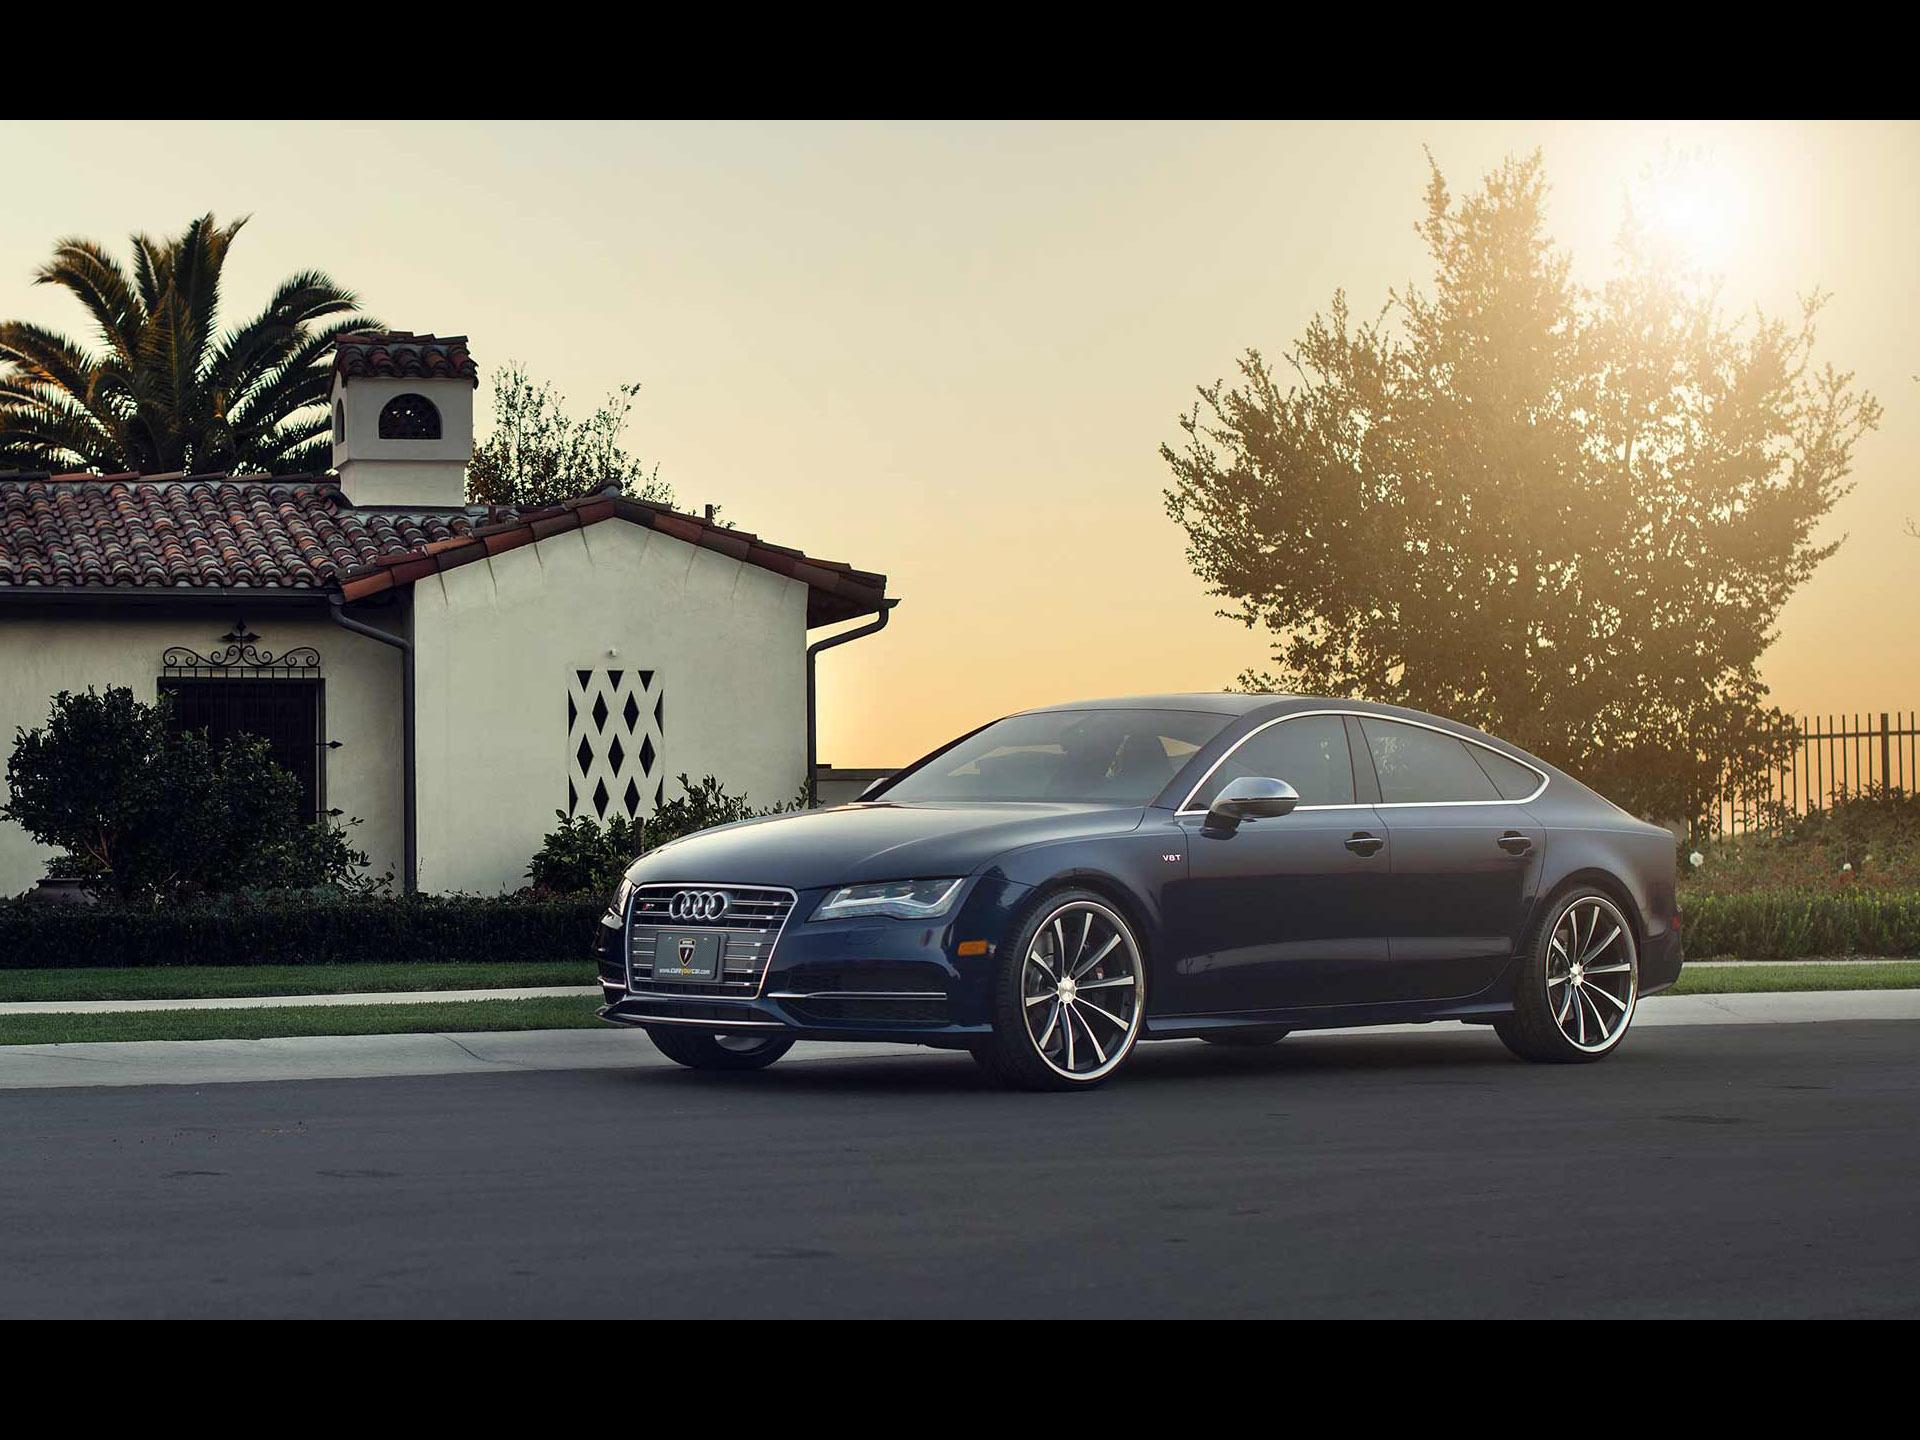 VOSSEN Wheels Audi S7 Sportback 2012 - アウディに嵌まる - 壁紙画像ブログ